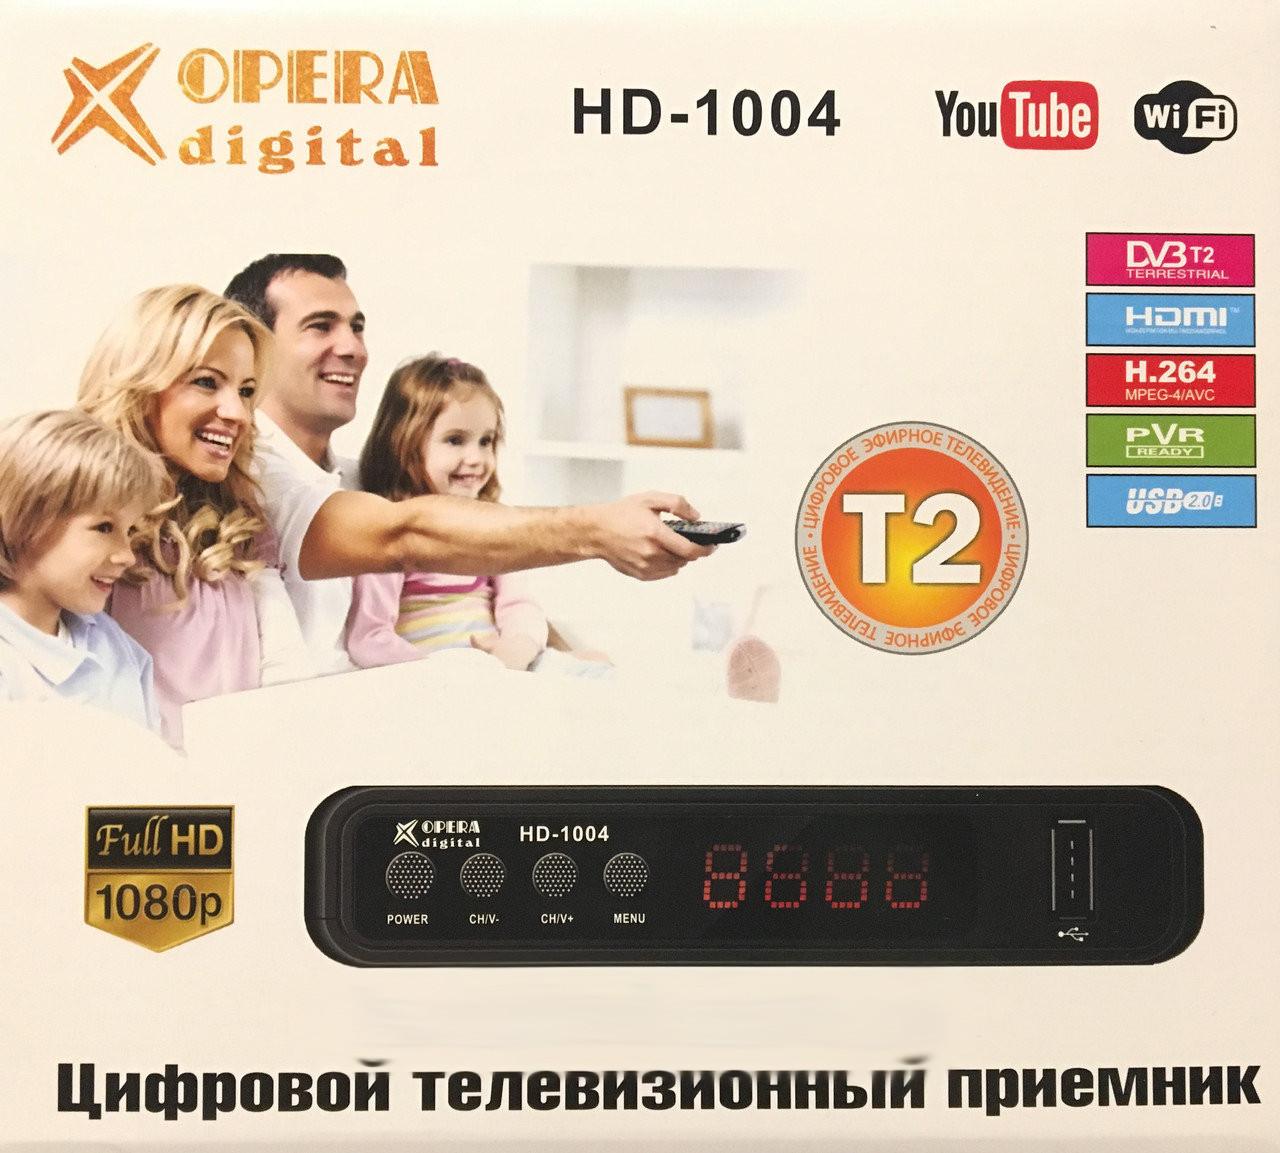 Тюнер Т2 OPERA DIGITAL HD-1004 DVB-T2 Пульт WiFi YouTube FullHD 32-58 канала